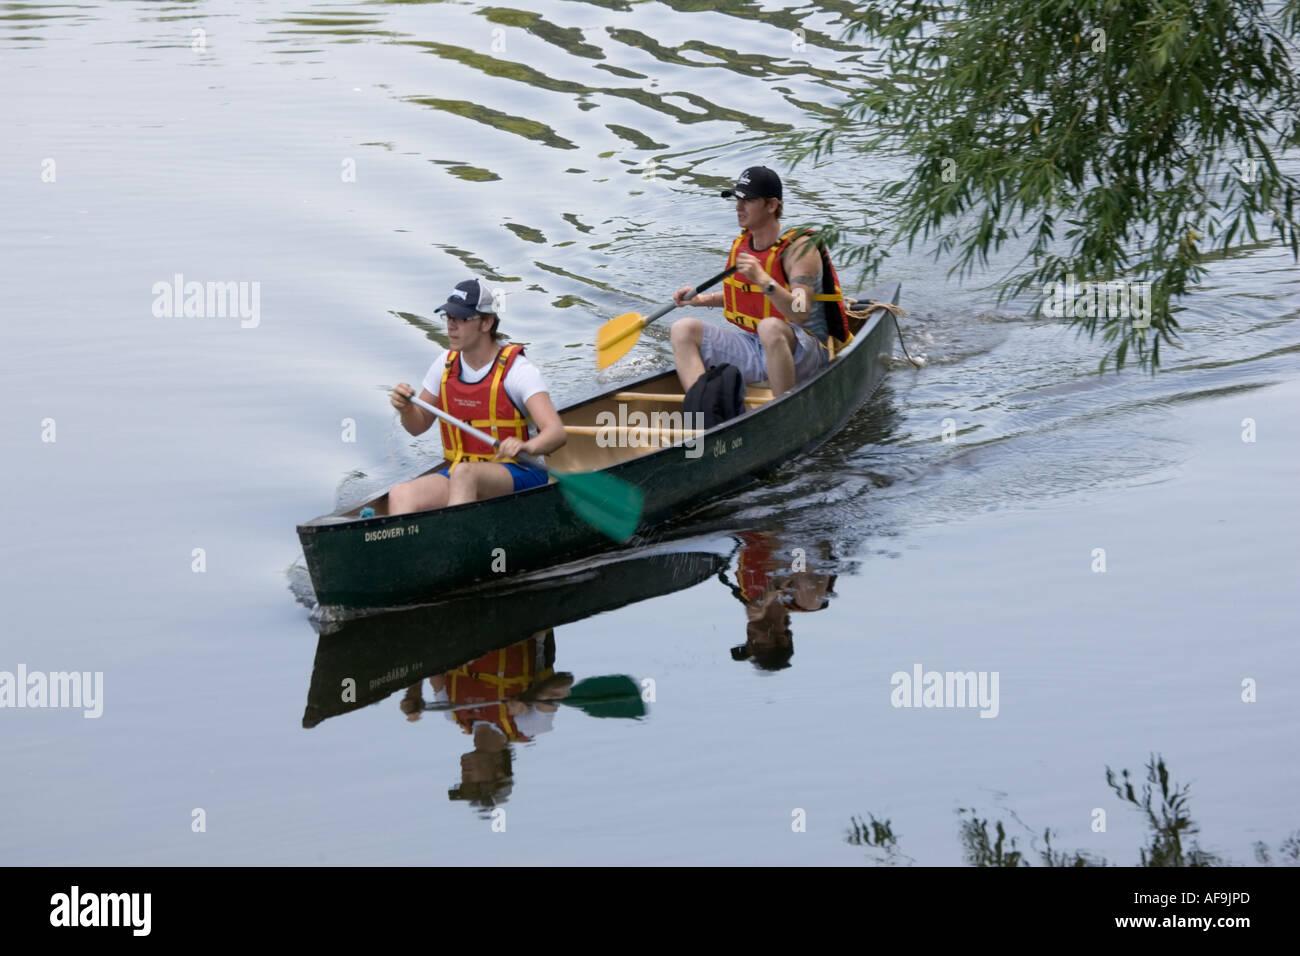 Two Men Paddling Canadian Canoe Stock Photos Amp Two Men